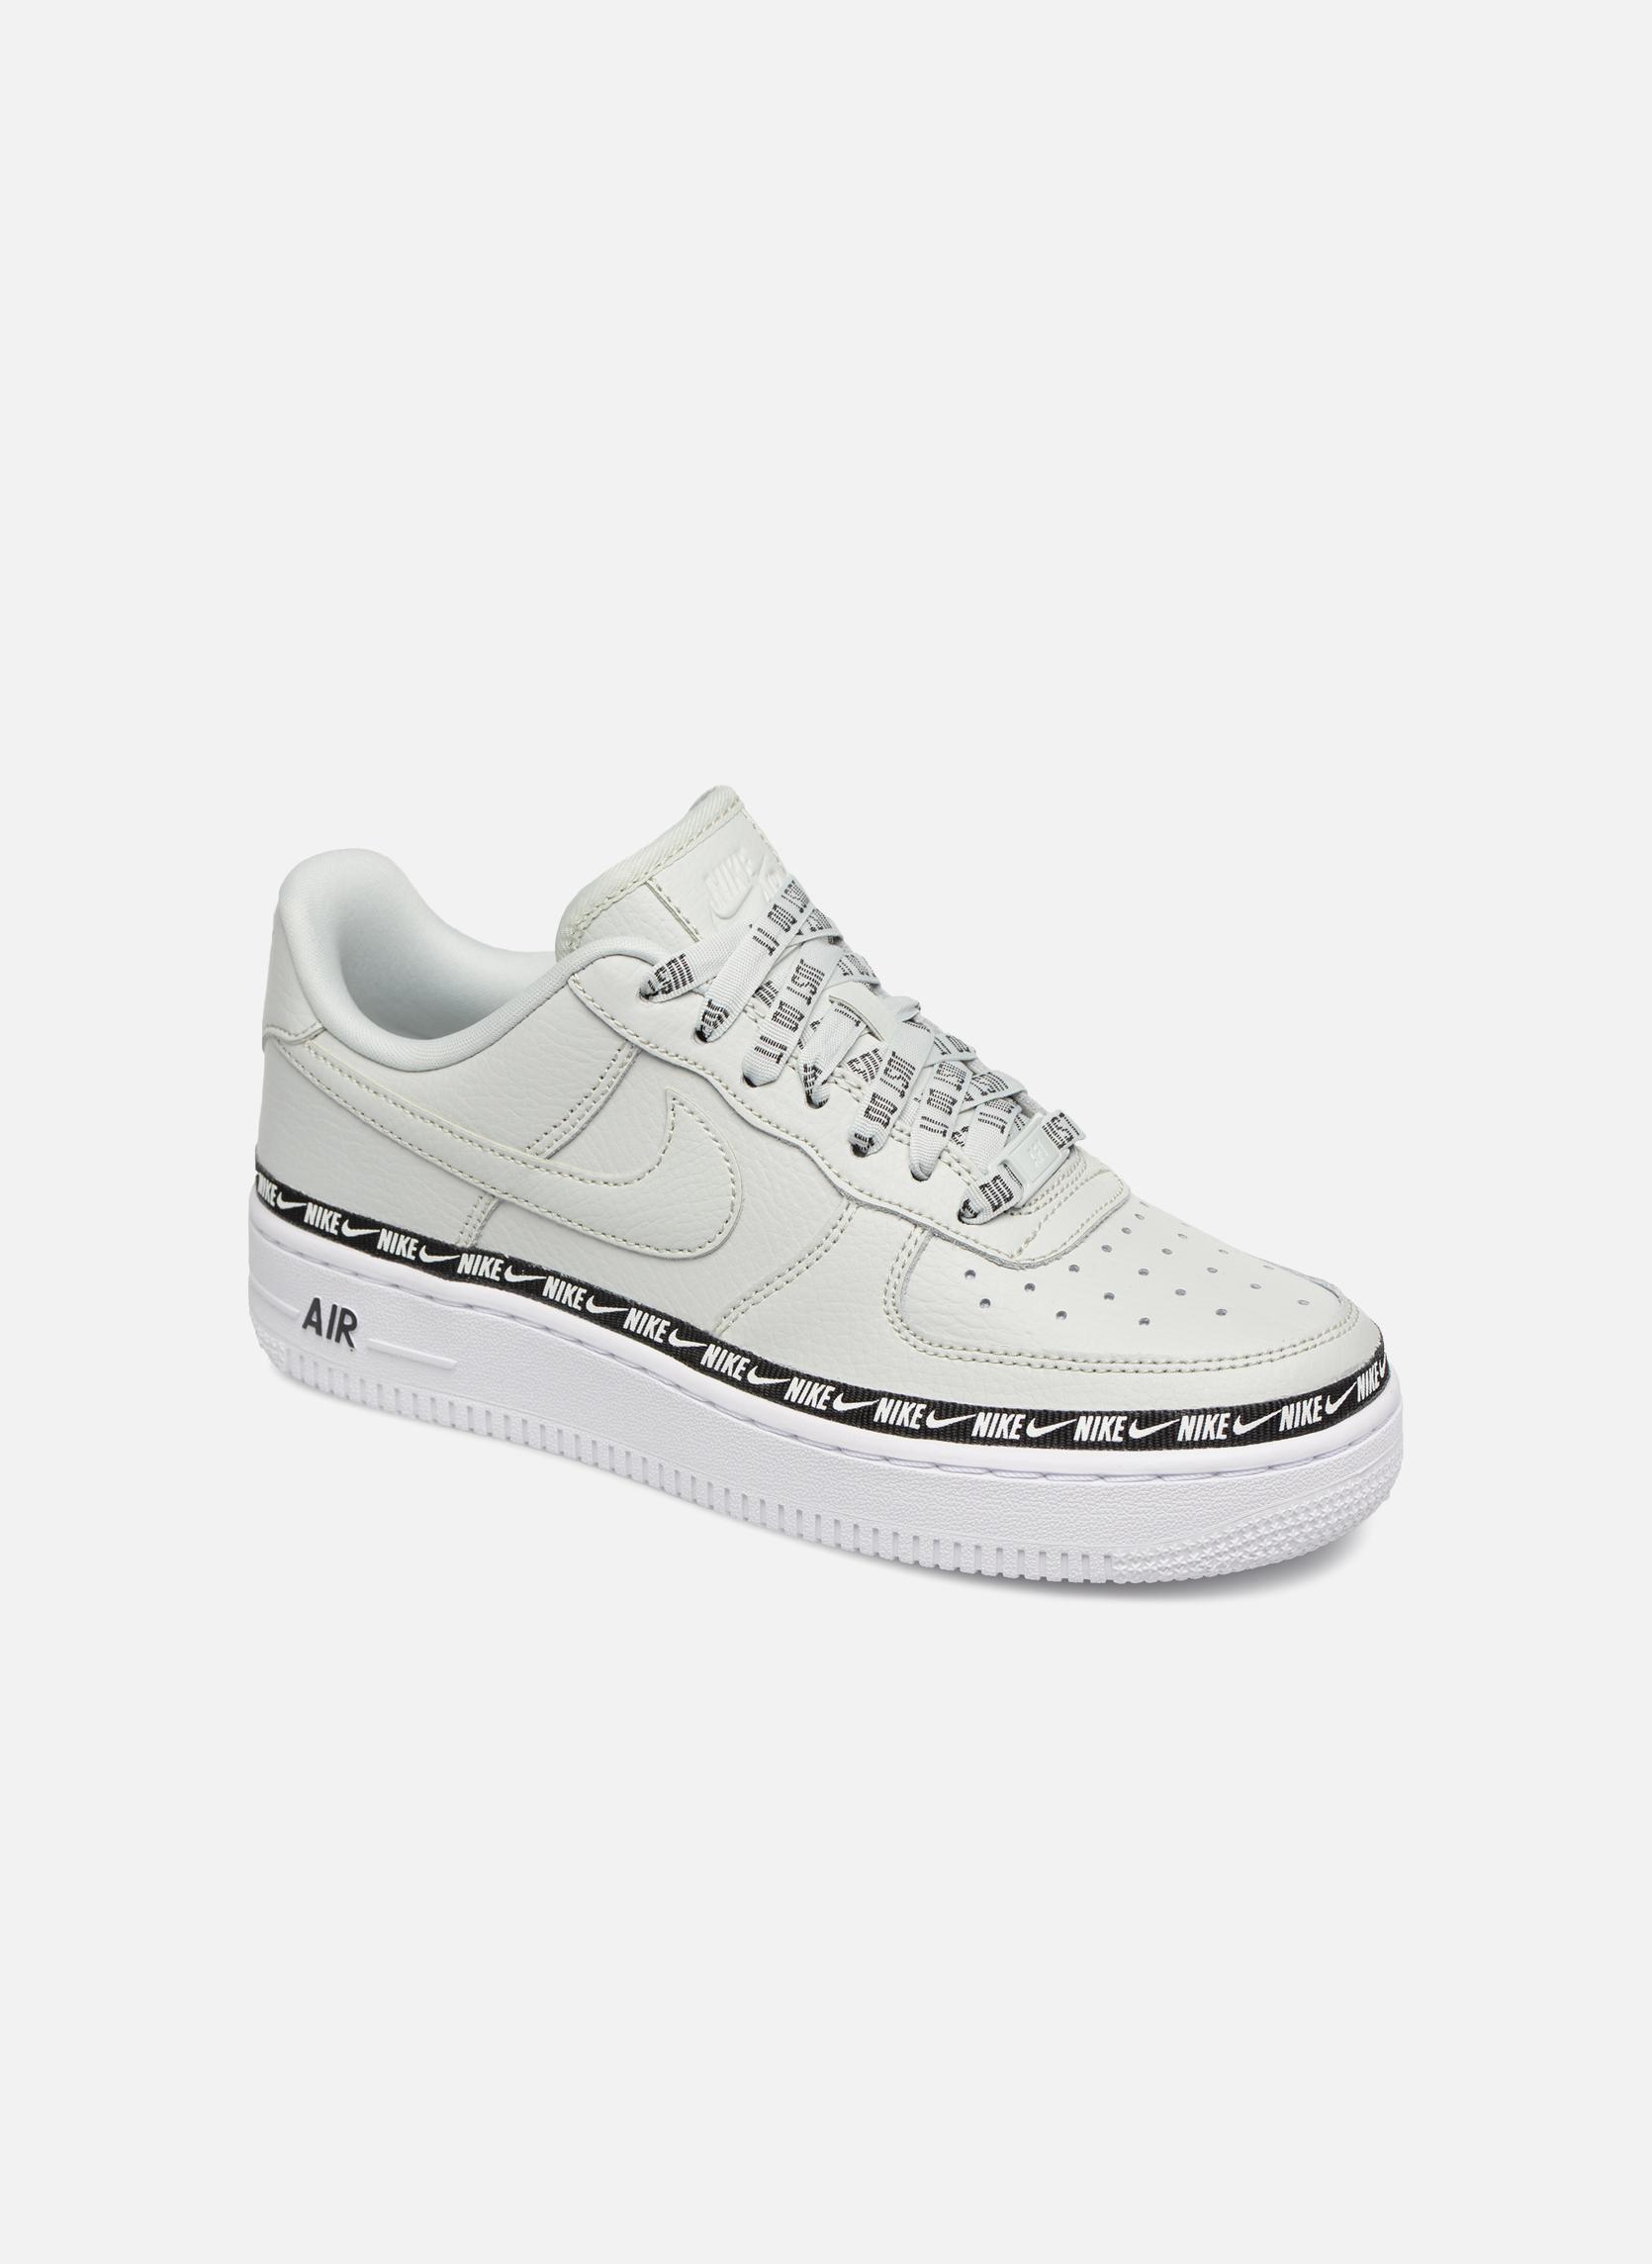 Nike Wmns Air Force 1 Sage Low white, 41 ab 88,36 ? im